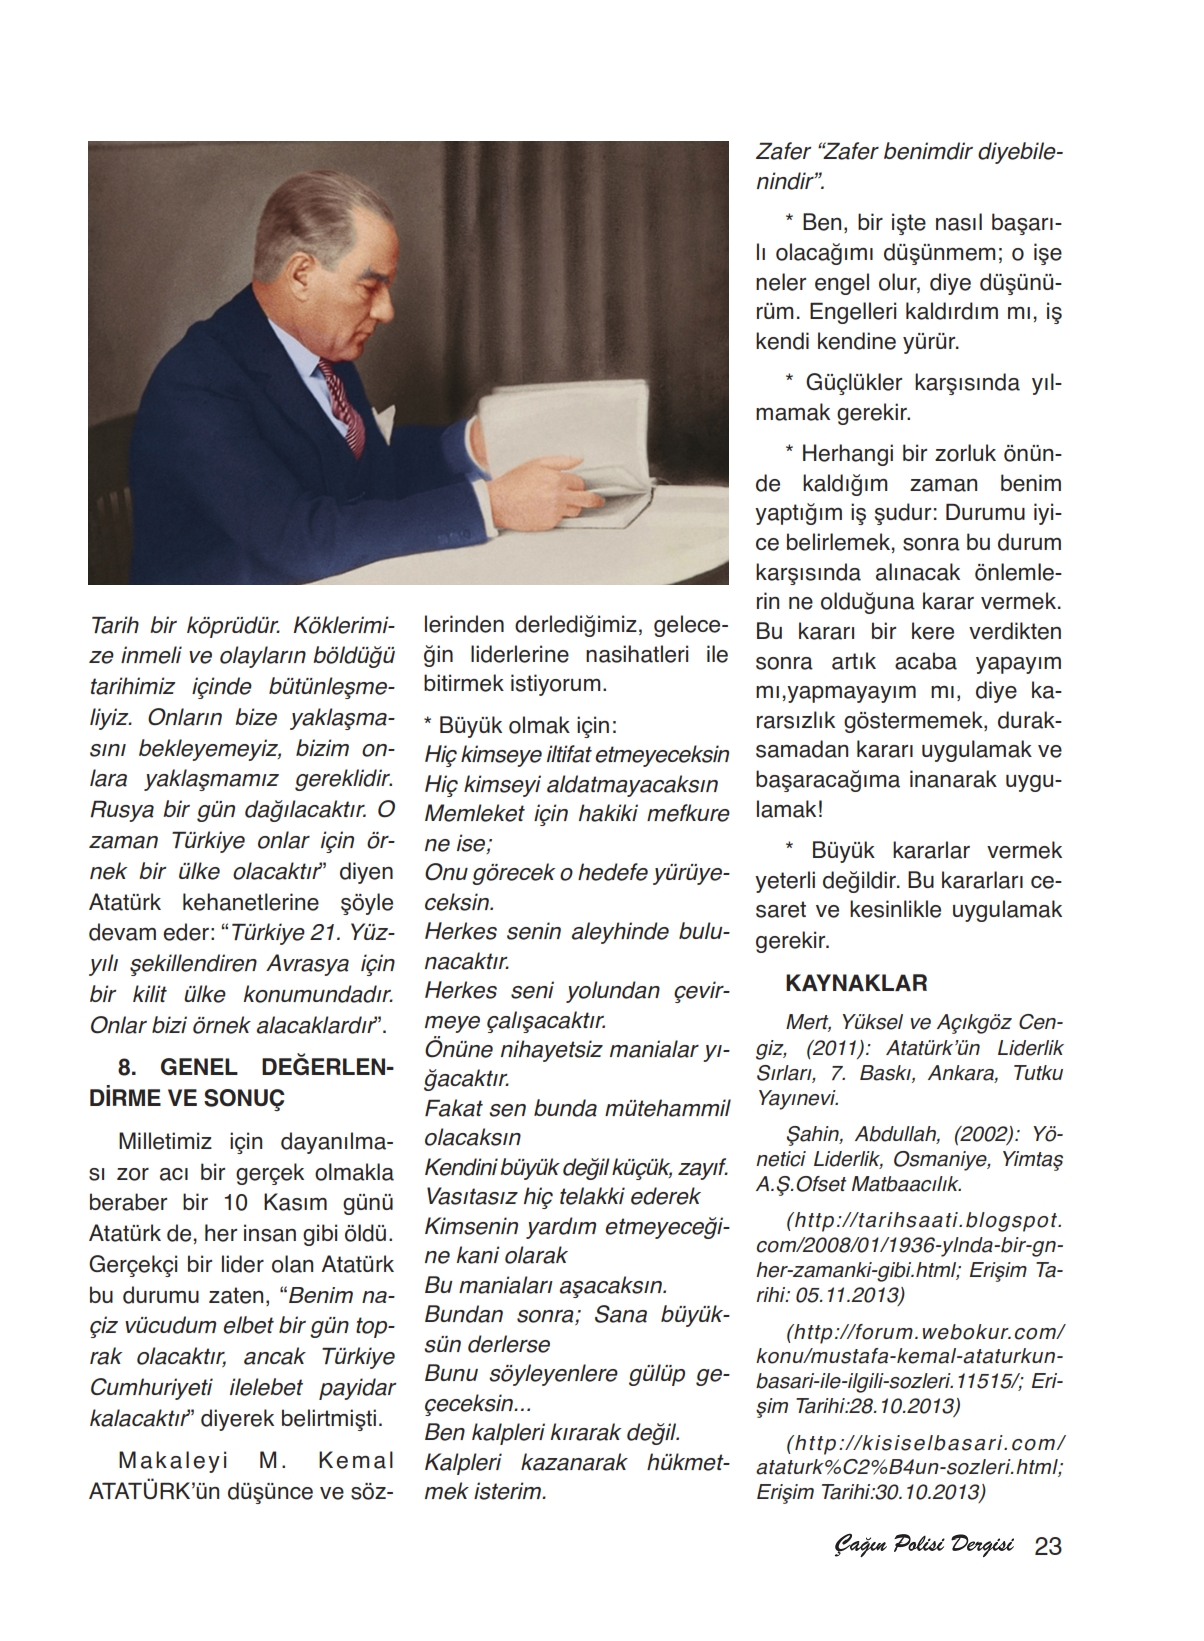 polis_dergi_aralik_2013_int_025